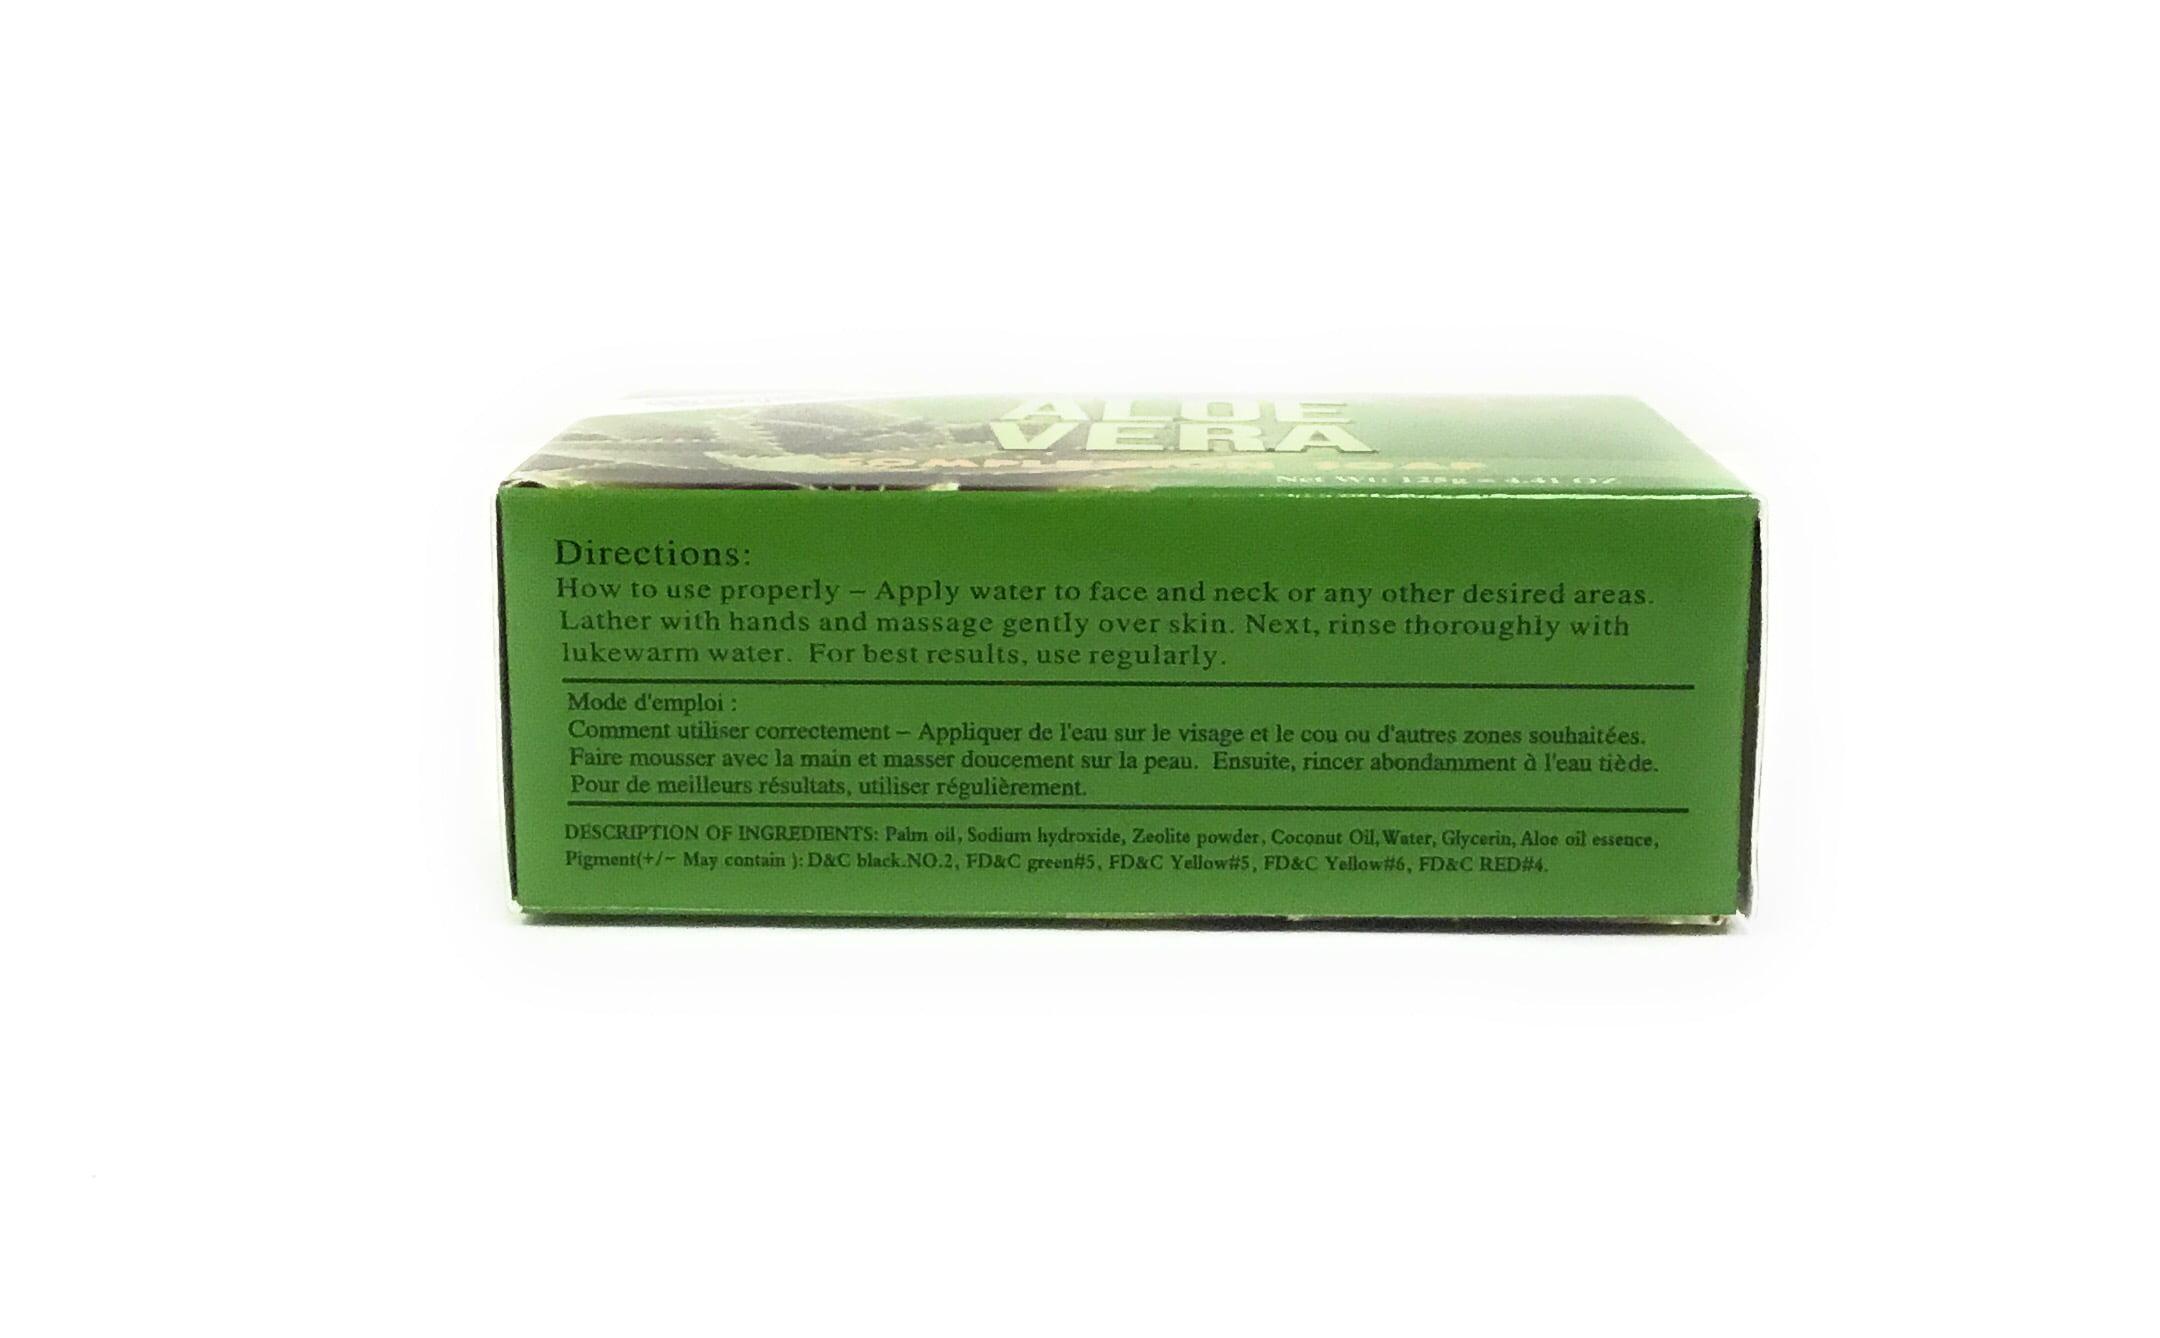 c10e75514514 Royal Touch Complexion Beauty Soap 125g (2 Pack) - Walmart.com